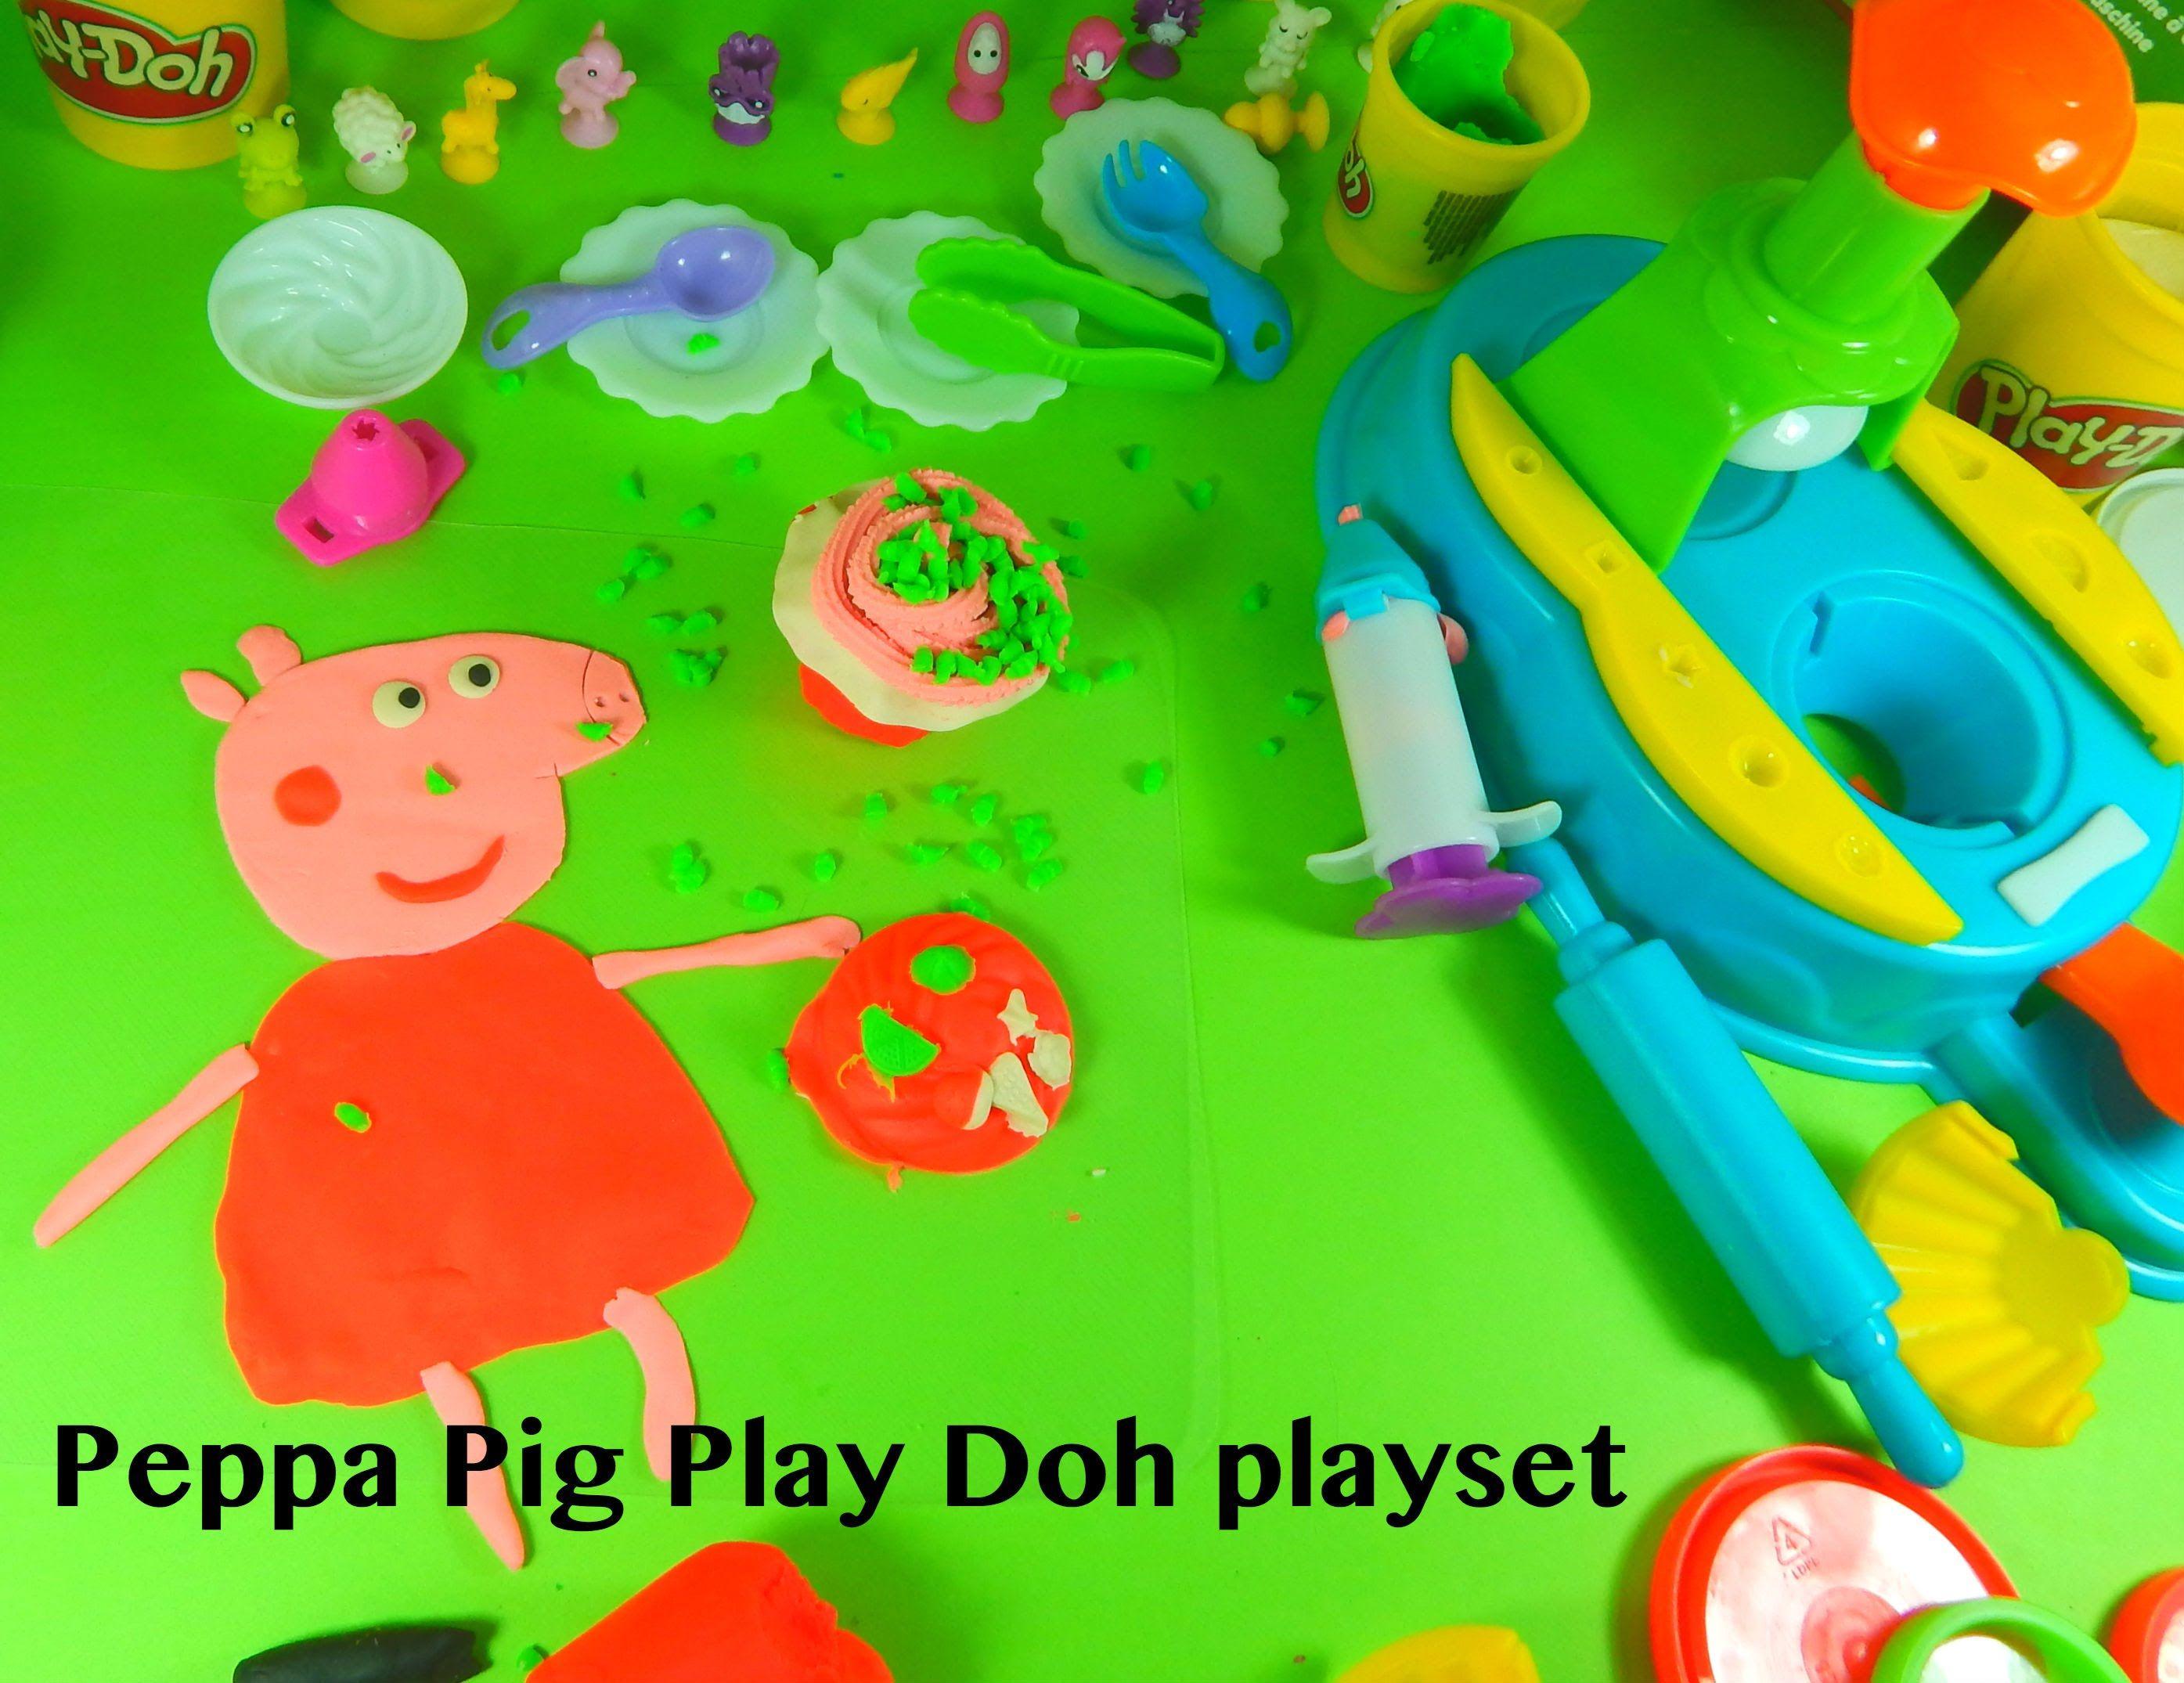 Plastilina Bambini ~ Peppa pig play doh ice cream candy horadekita play doh hello kitty